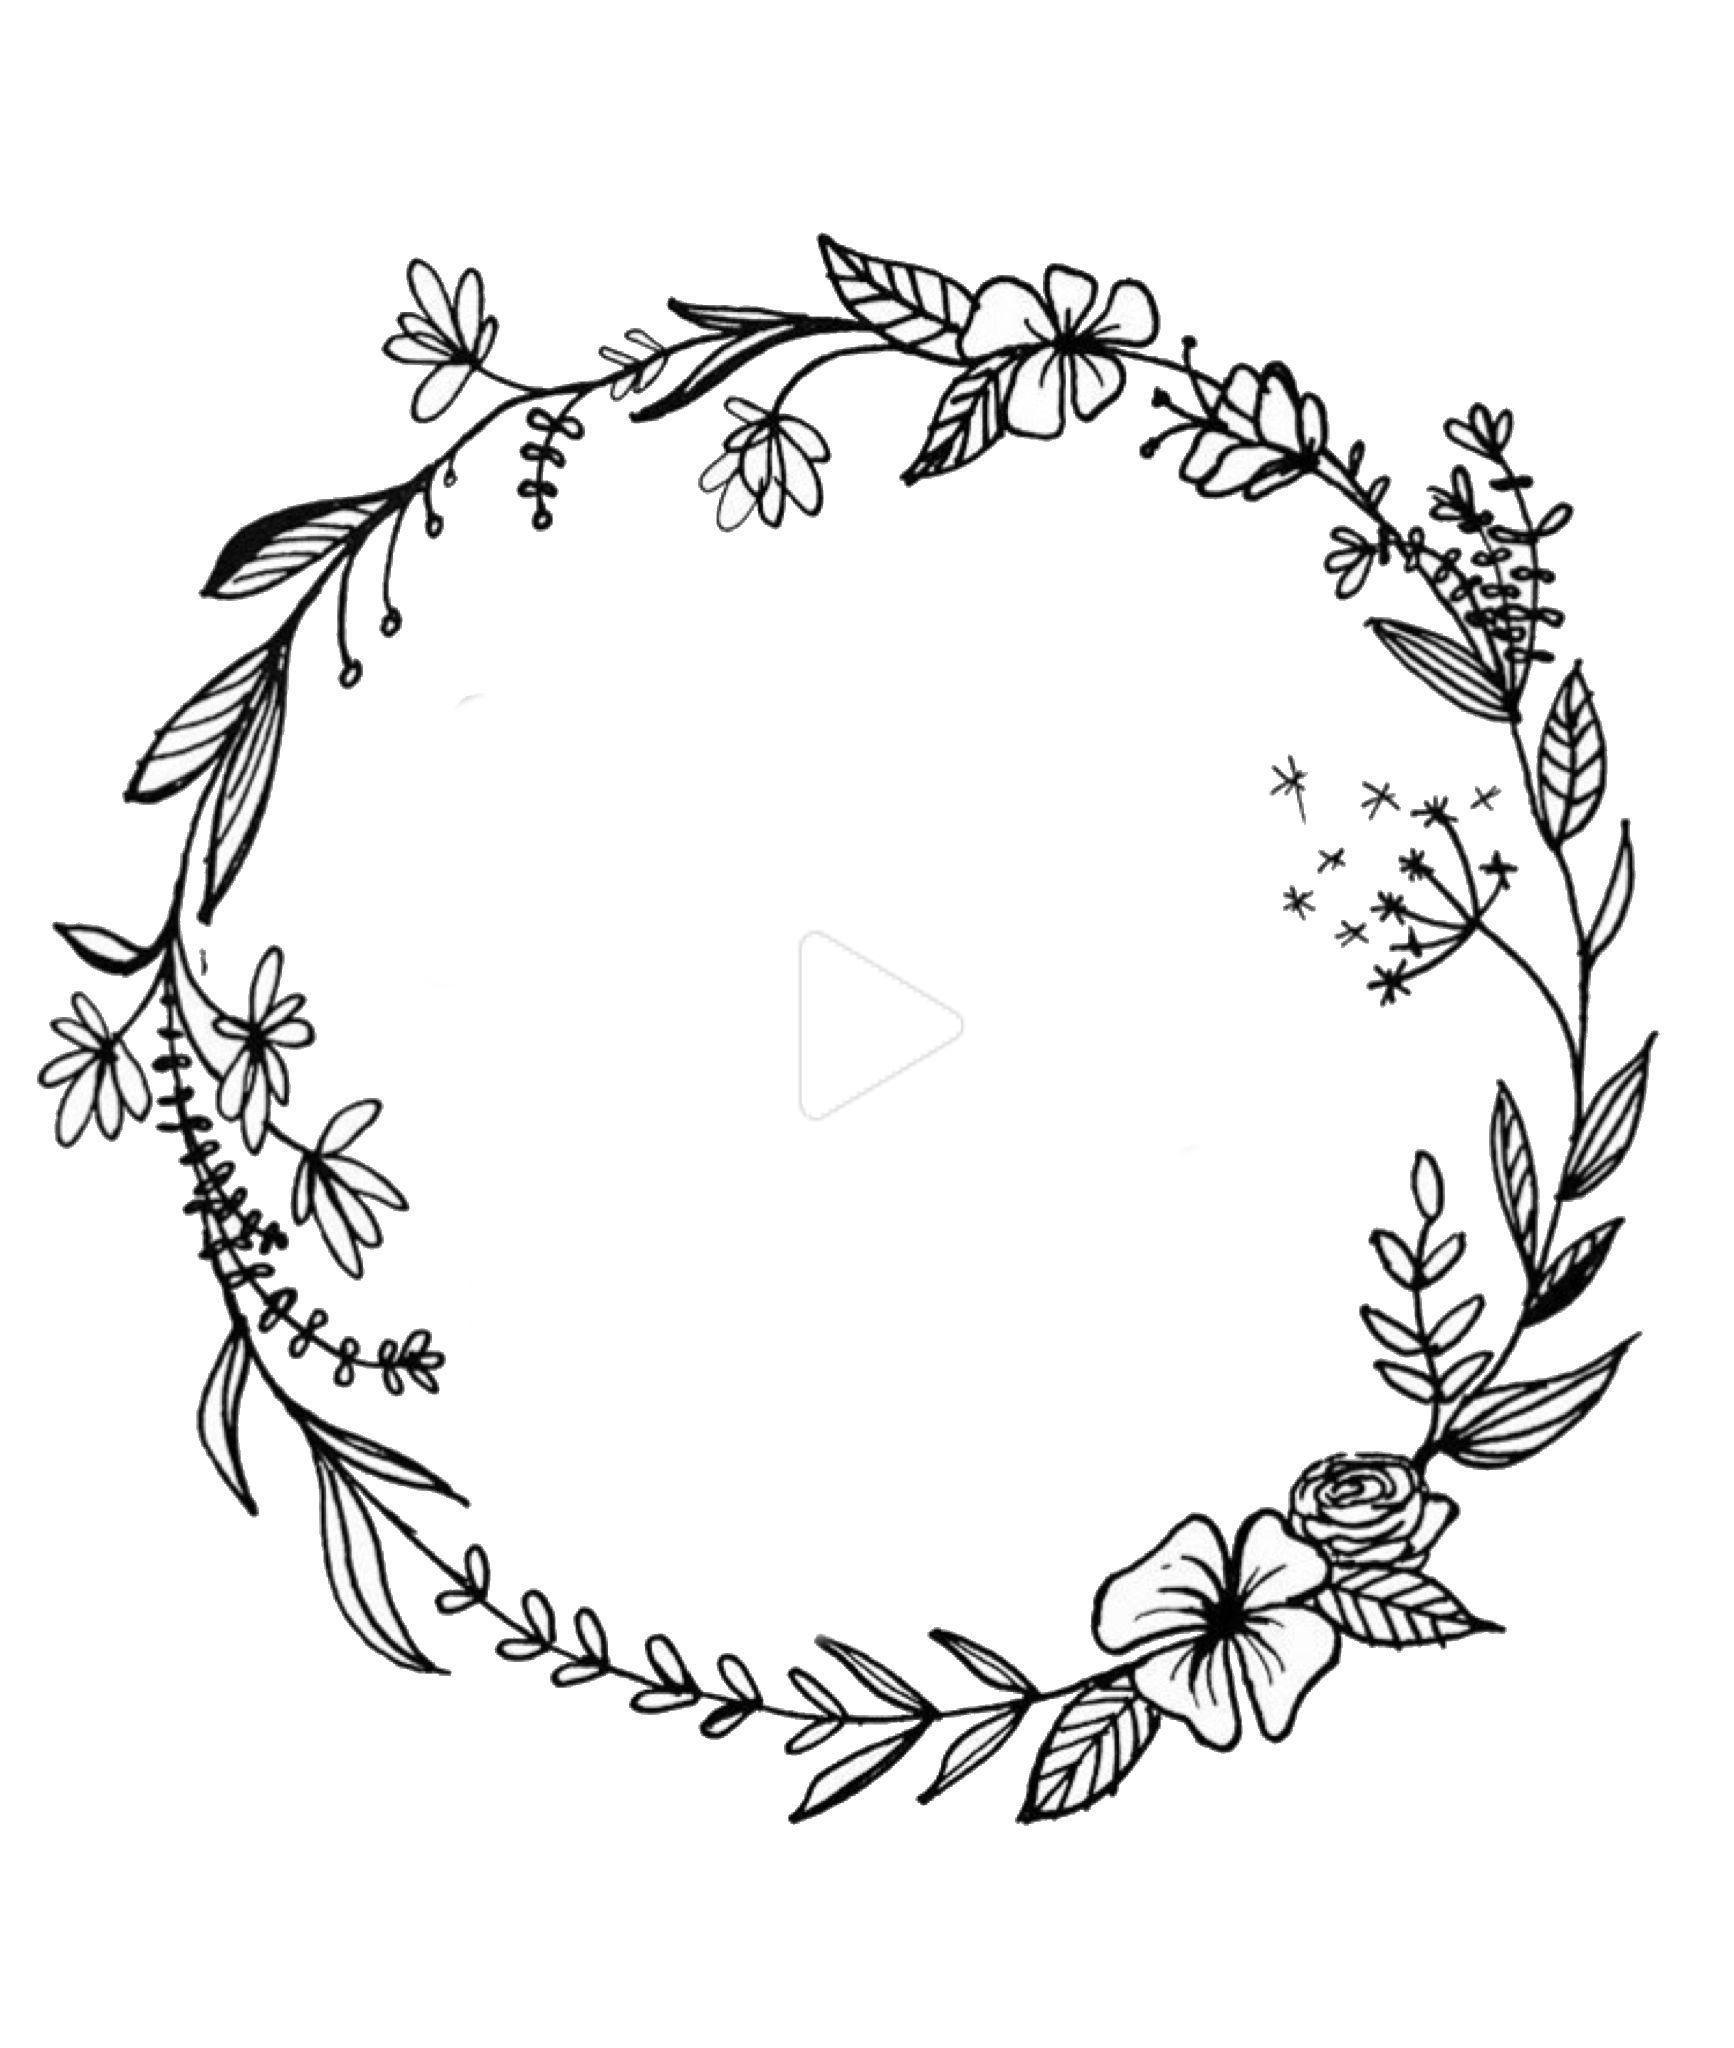 Bulletjournal Doodles Corona Dibujo Como Dibujar Tatuajes Circulo De Flores